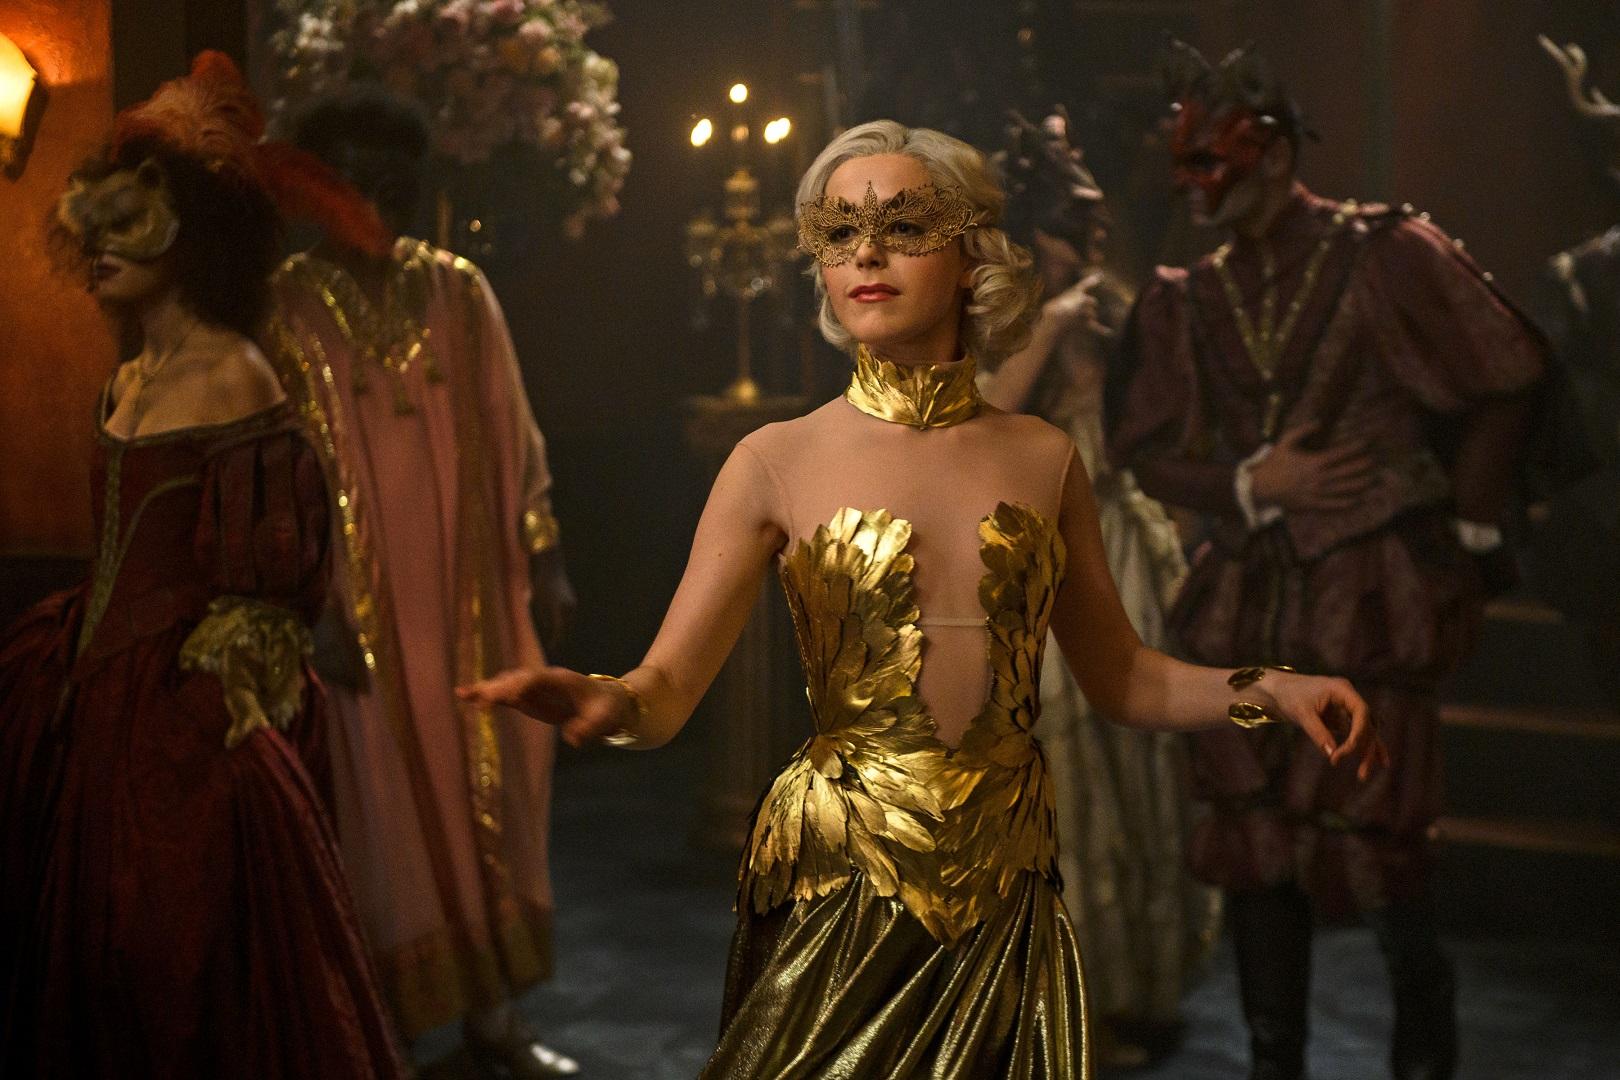 Veredito da segunda parte da primeira temporada de O Mundo Sombrio de Sabrina